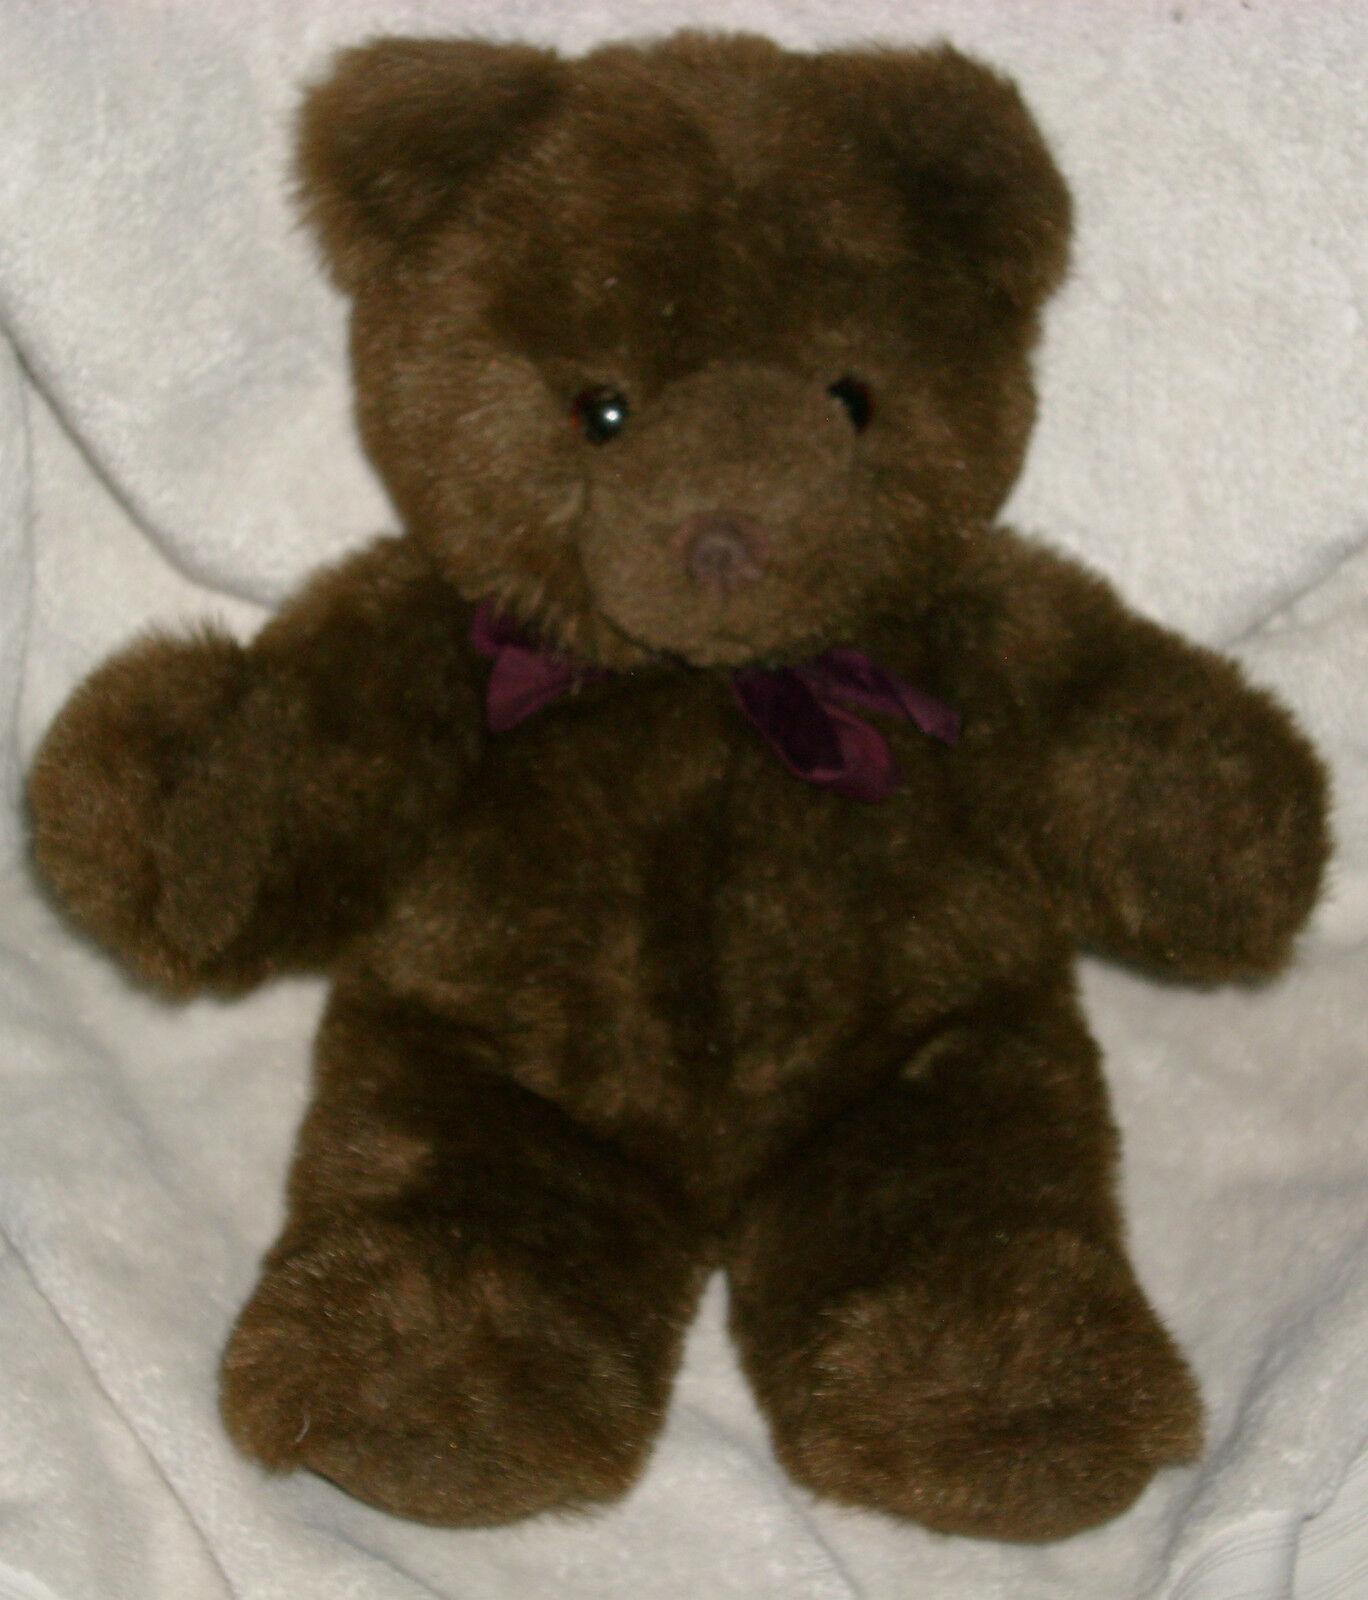 16  VINTAGE 1983 GUND COLLECTORS CLASSIC BROWN TEDDY BEAR STUFFED ANIMAL PLUSH